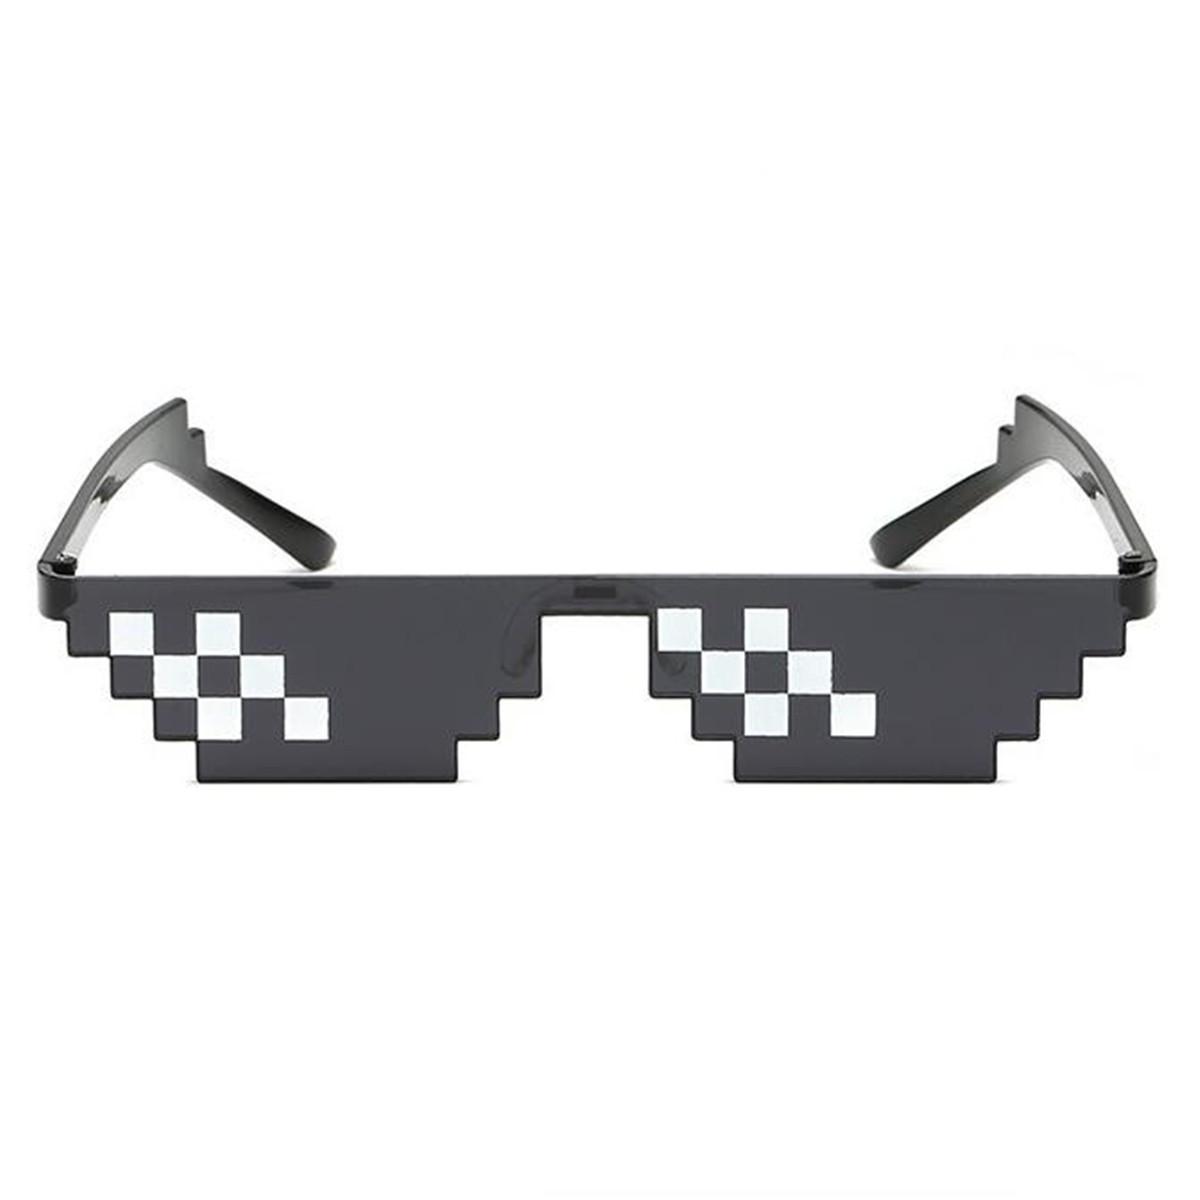 1pcs Mosaic 8 Bit Pixel Deal With It Sunglasses Unisex Thug Life Glasses Cool